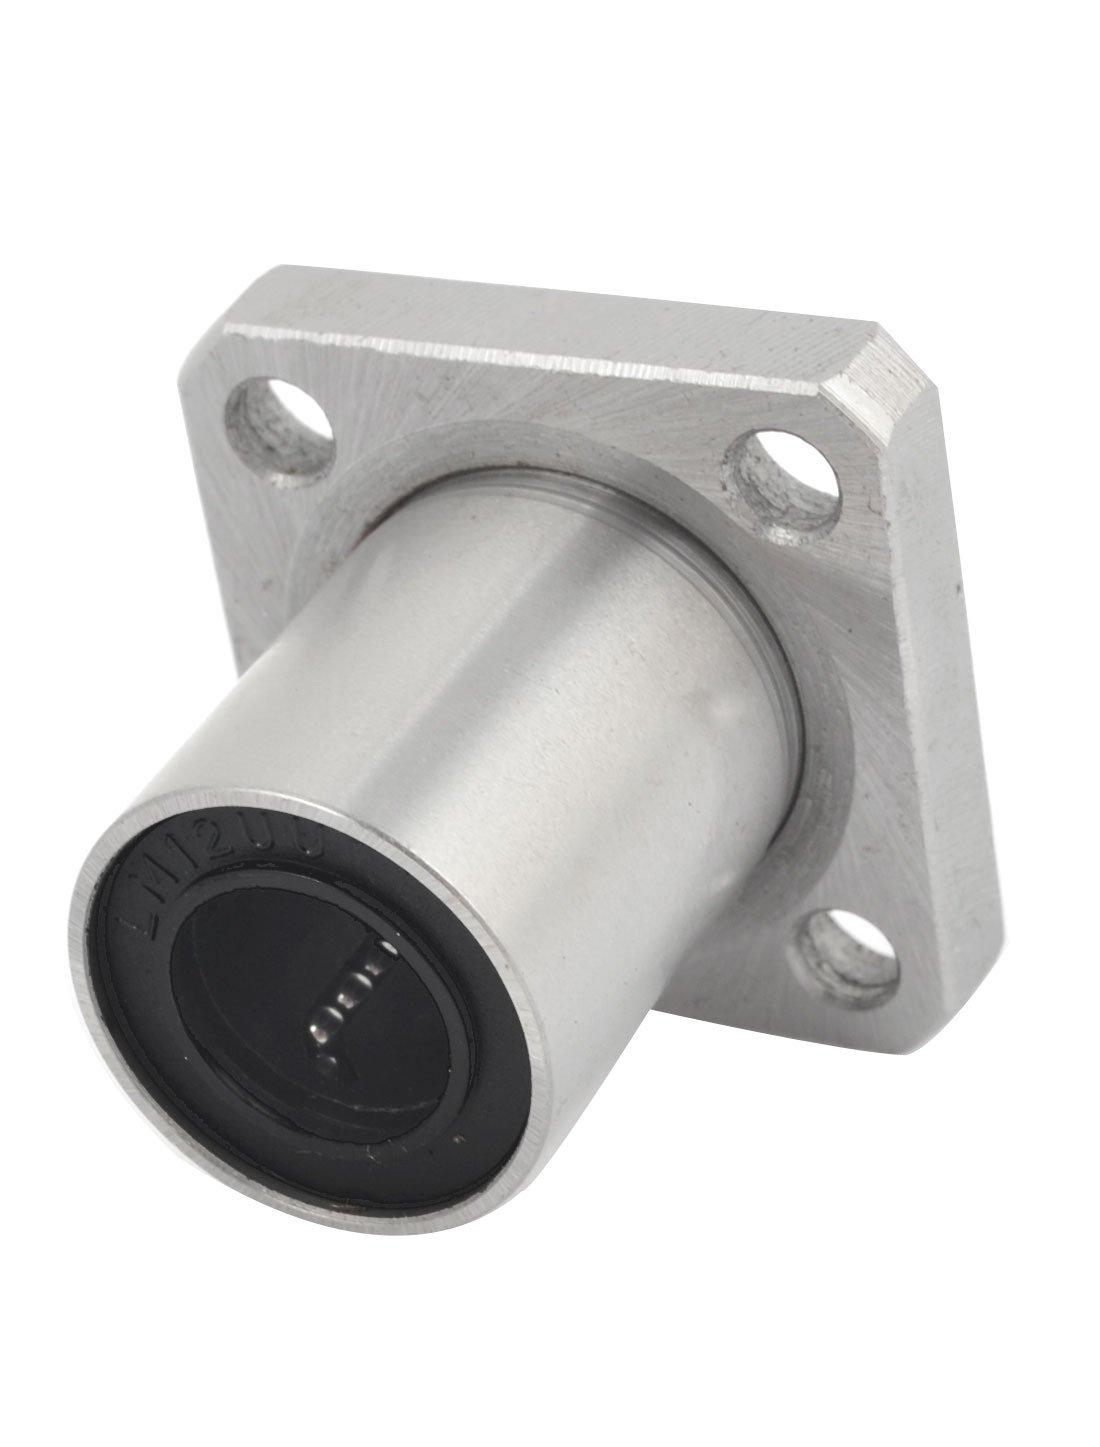 8mm Inner Diameter Square Flange Linear Motion Bushing Ball Bearing LMK8UU LW